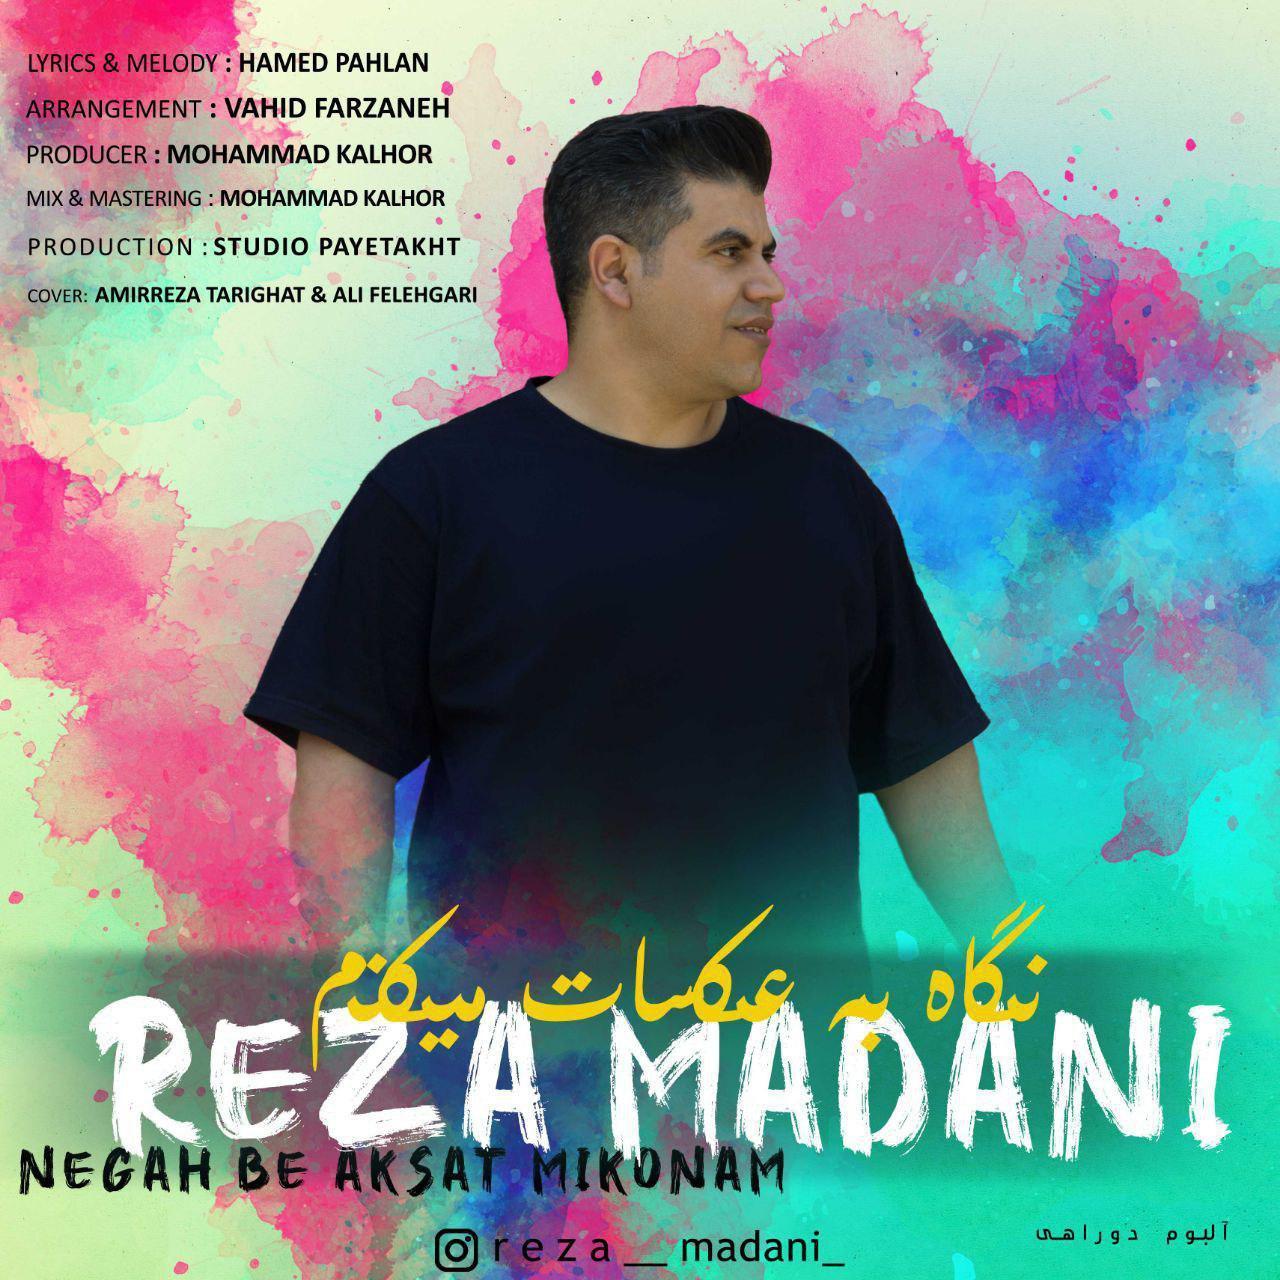 Reza Madani – Negah Be Aksat Mikonam